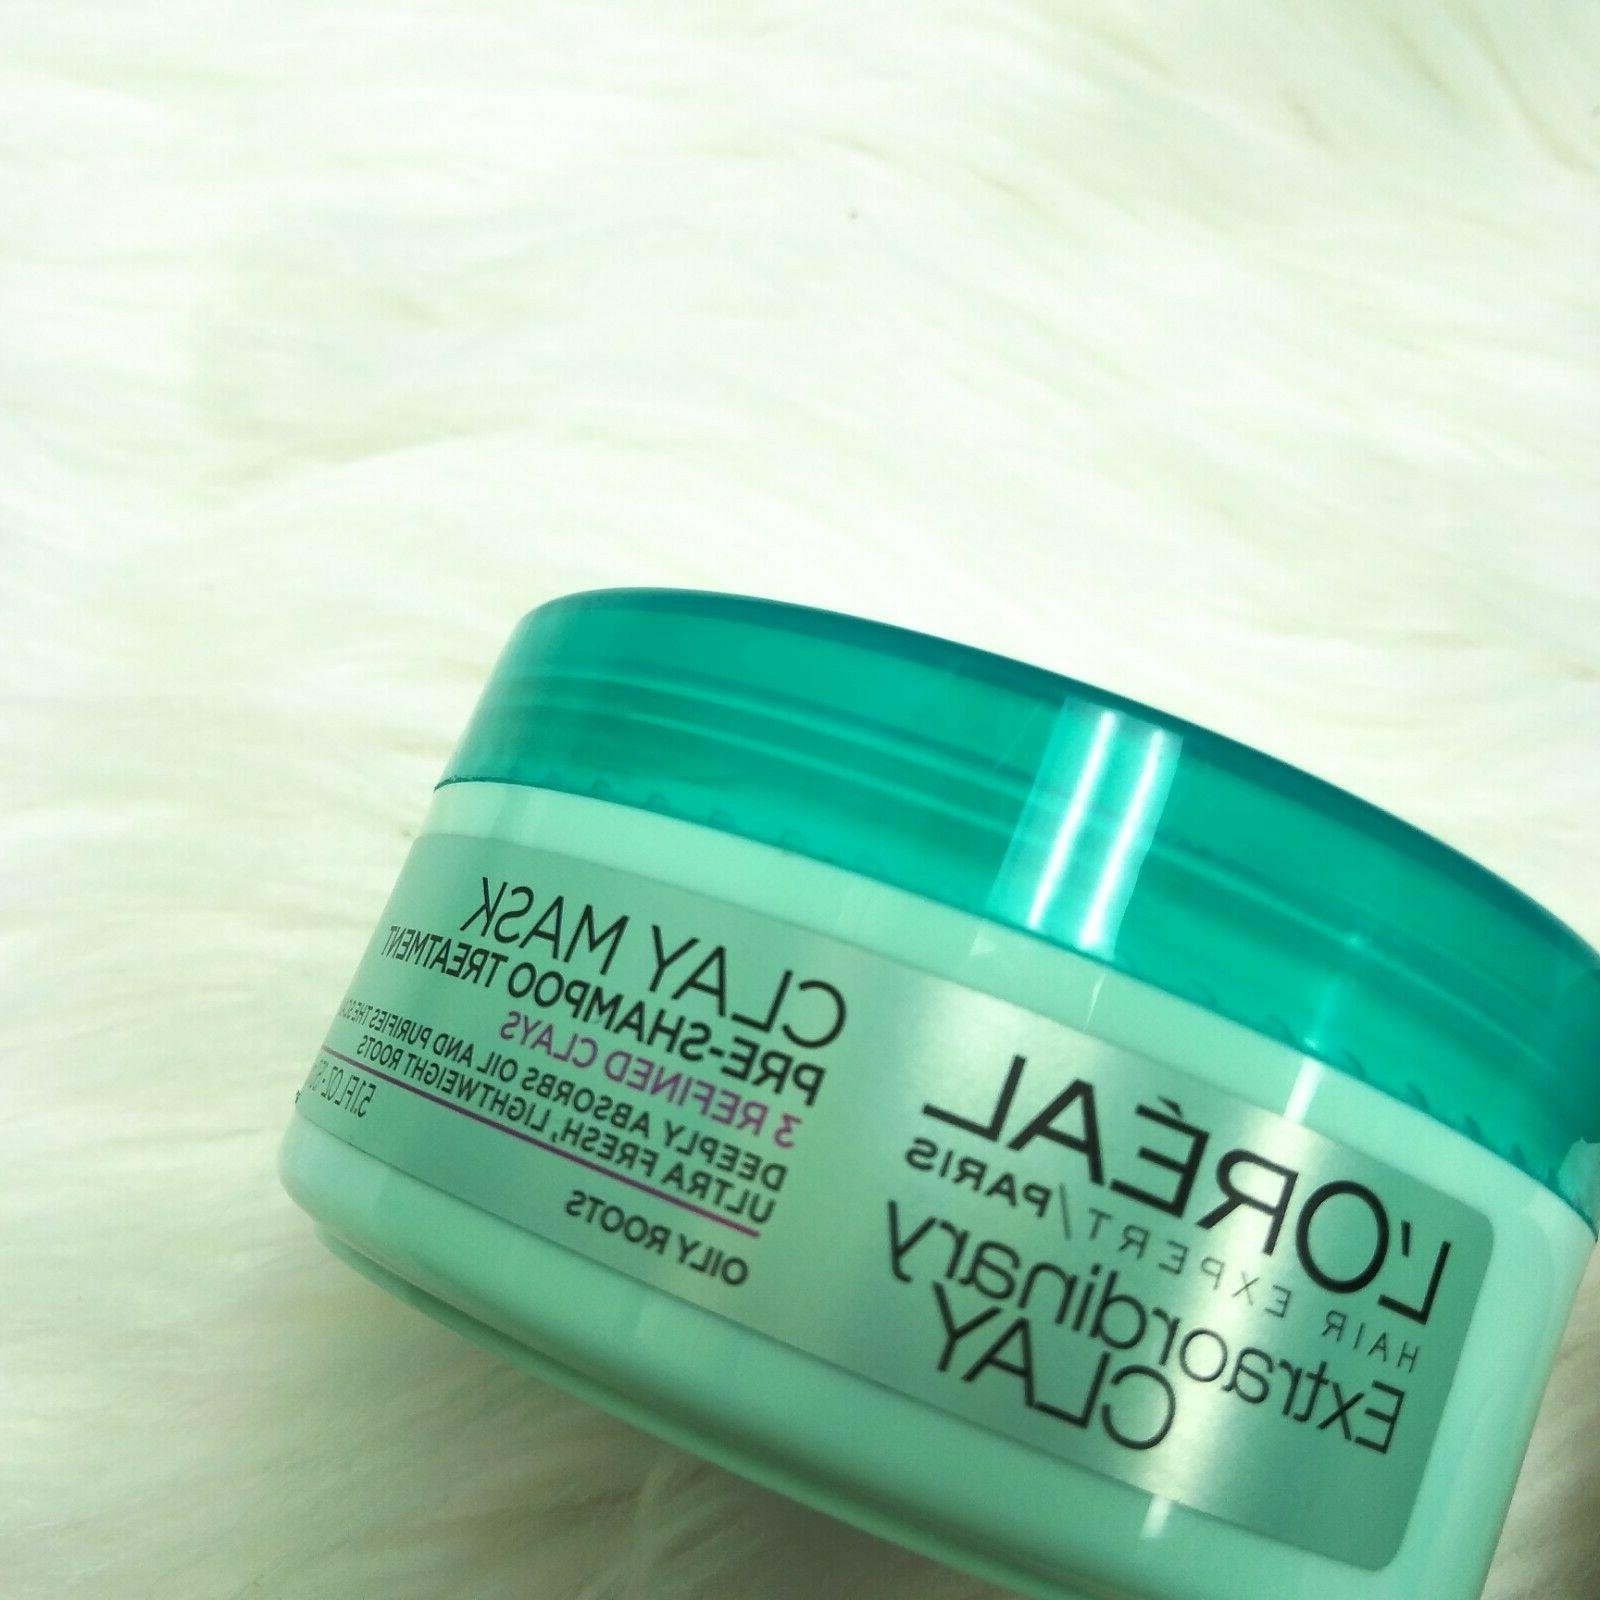 New PARIS Expert Extraordinary Clay Pre-Shampoo Mask, 5.1 fl